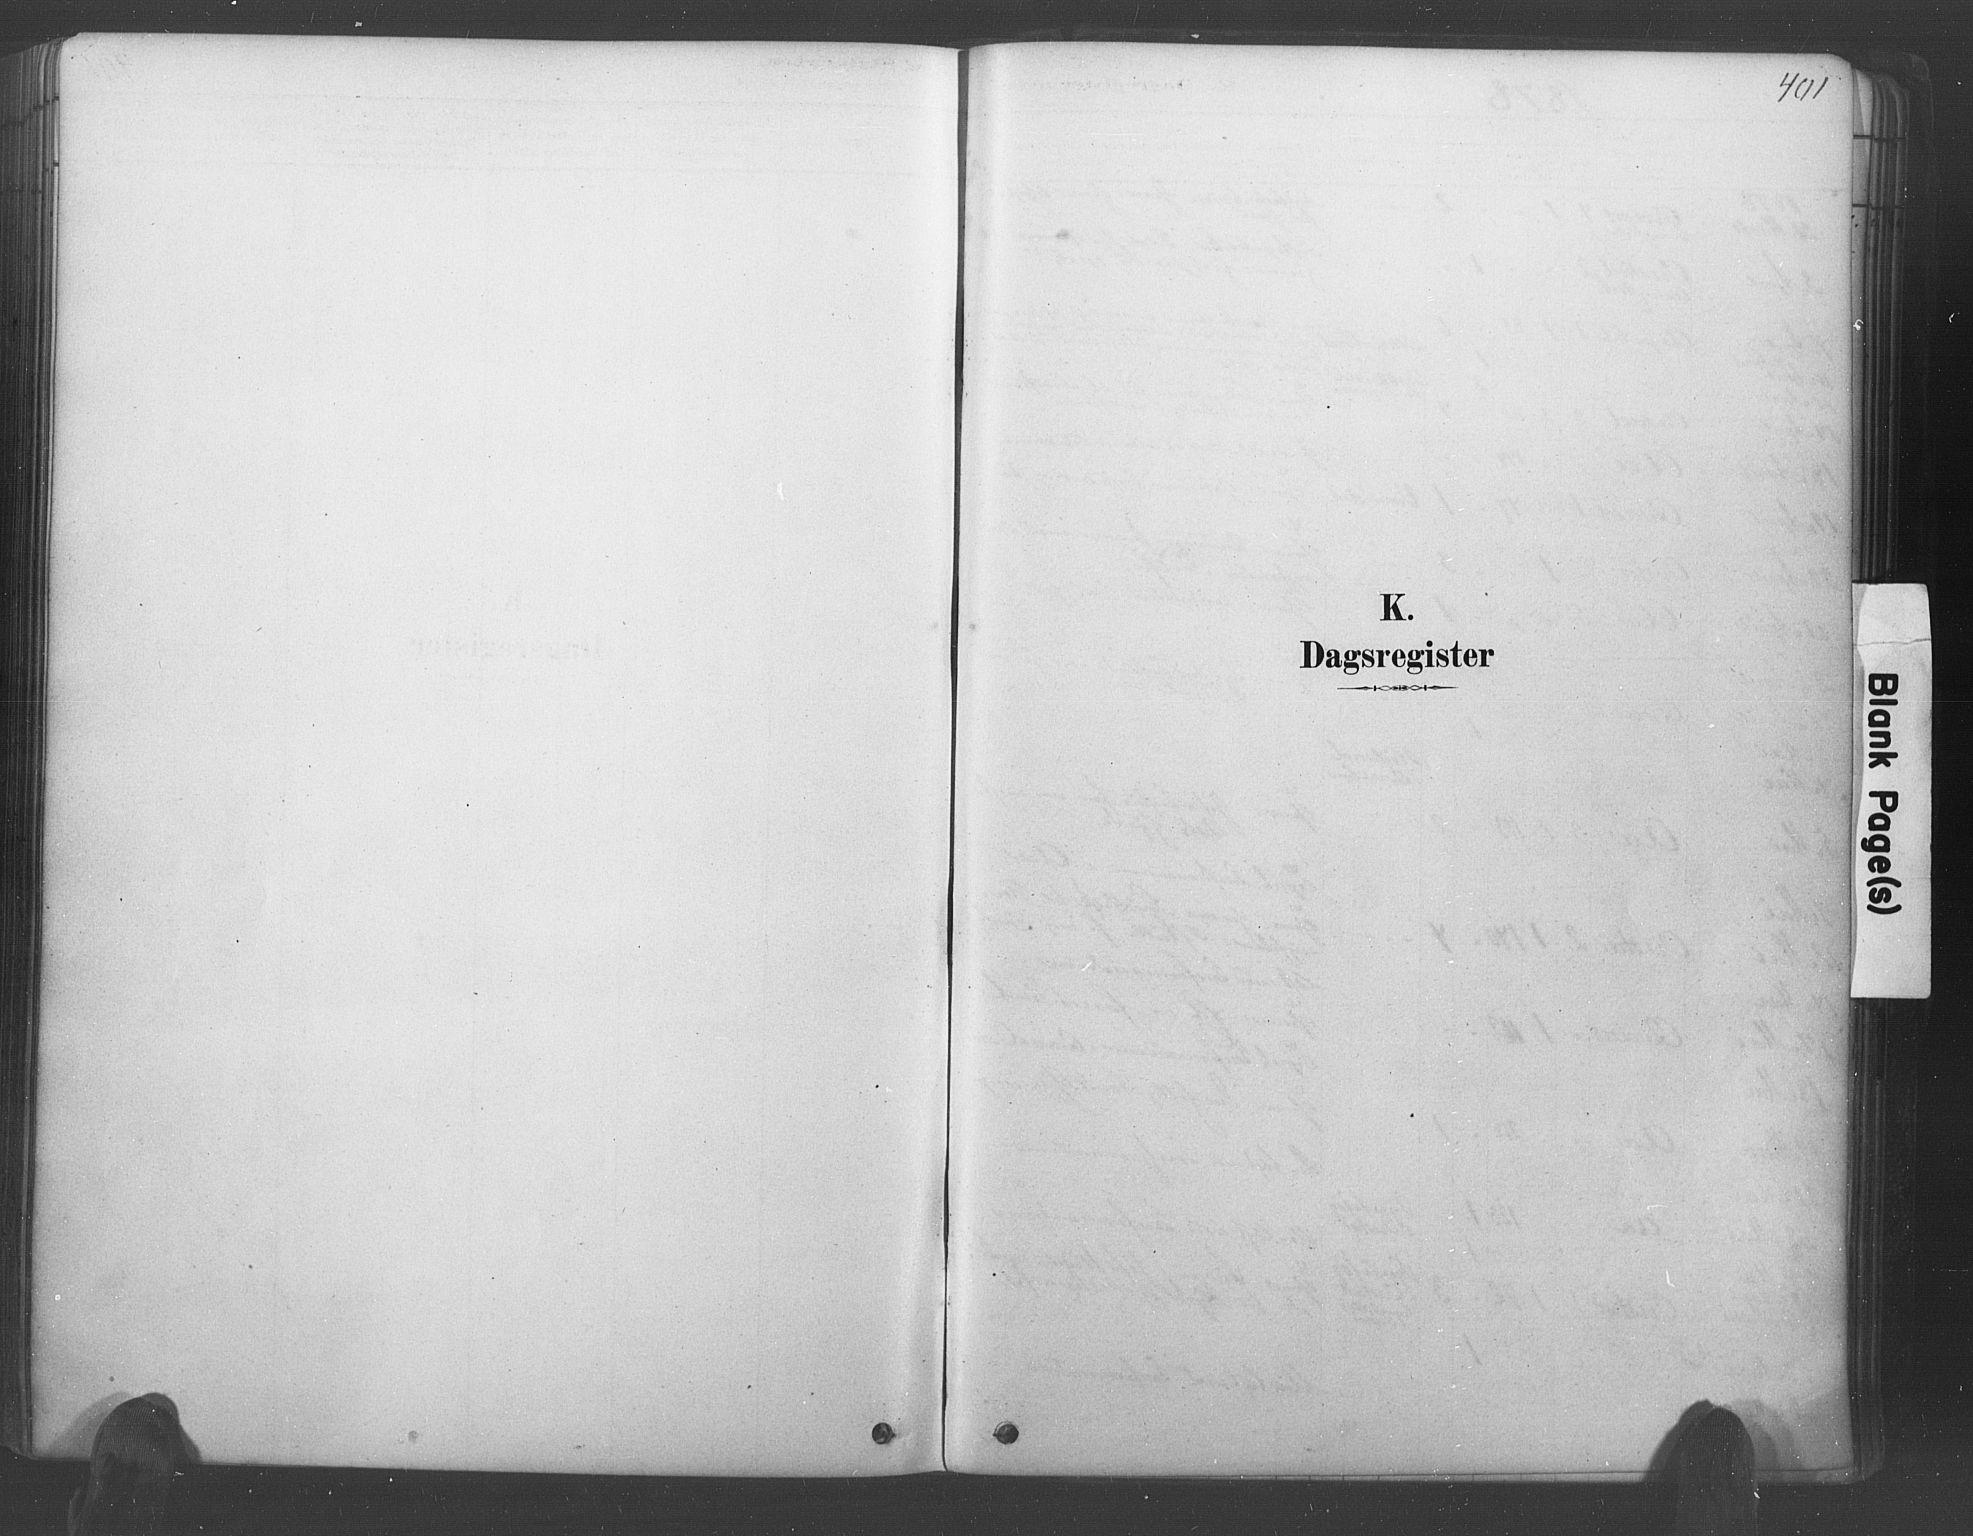 SAK, Lyngdal sokneprestkontor, F/Fa/Fac/L0011: Ministerialbok nr. A 11, 1878-1893, s. 401